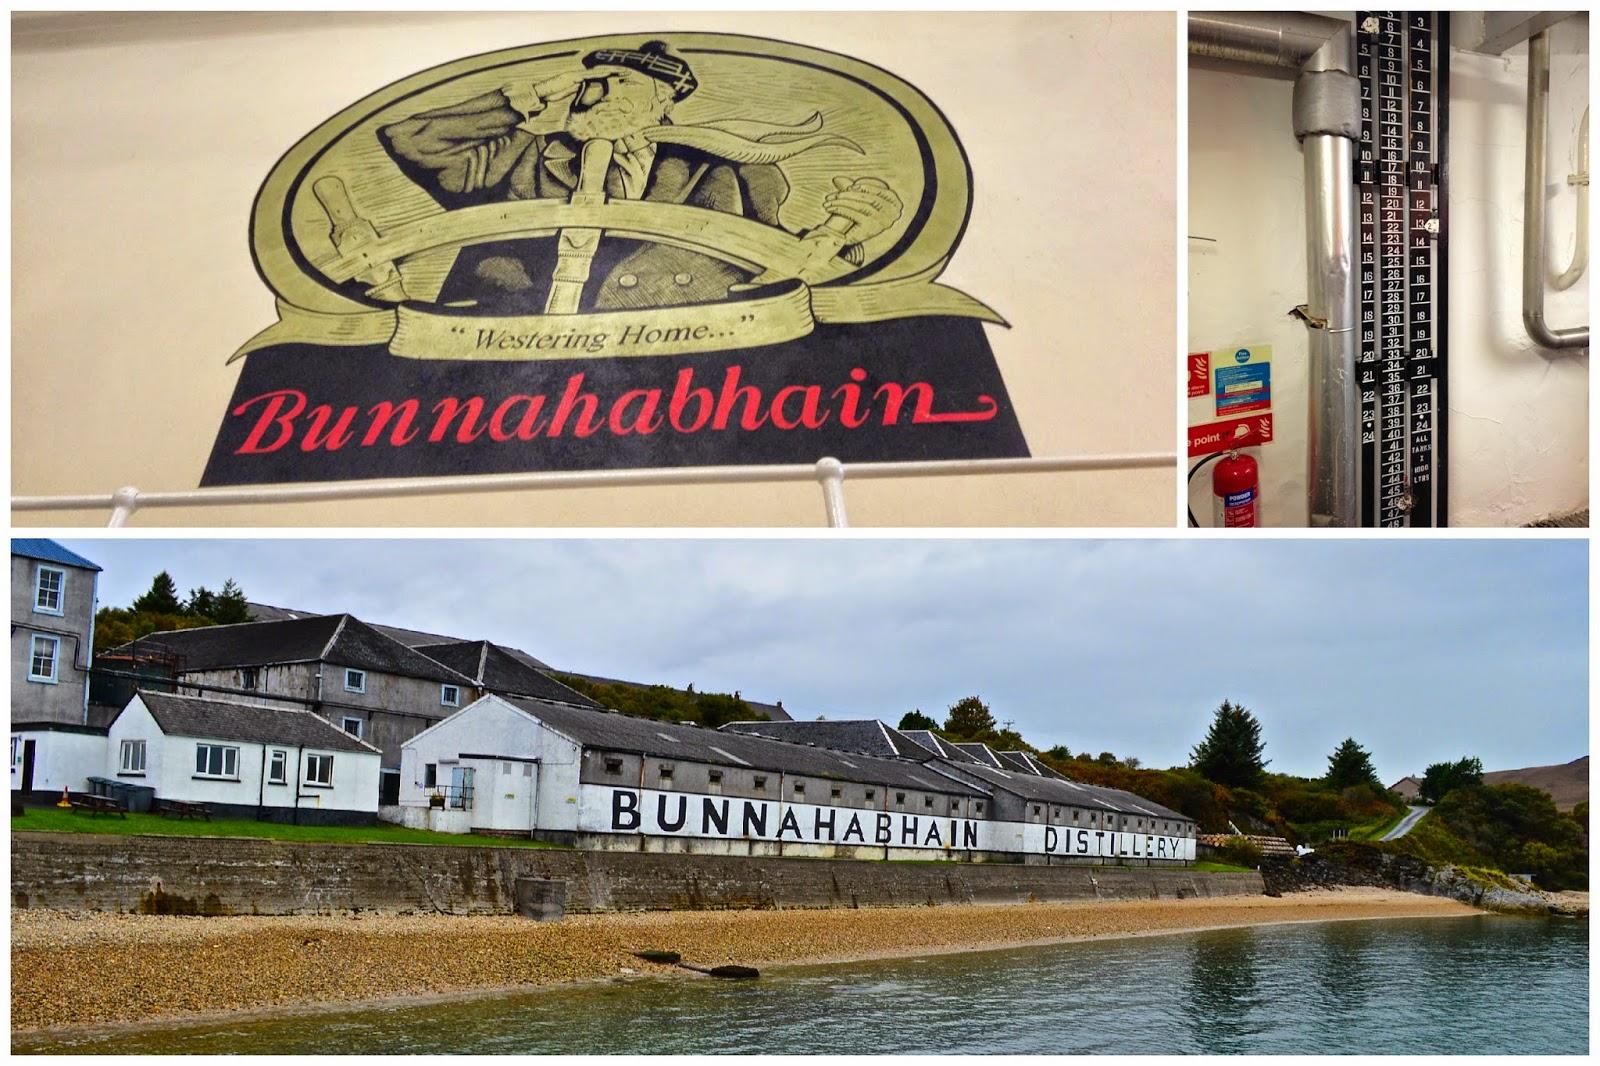 Bunnahabhain, Isle of Islay, Scotland